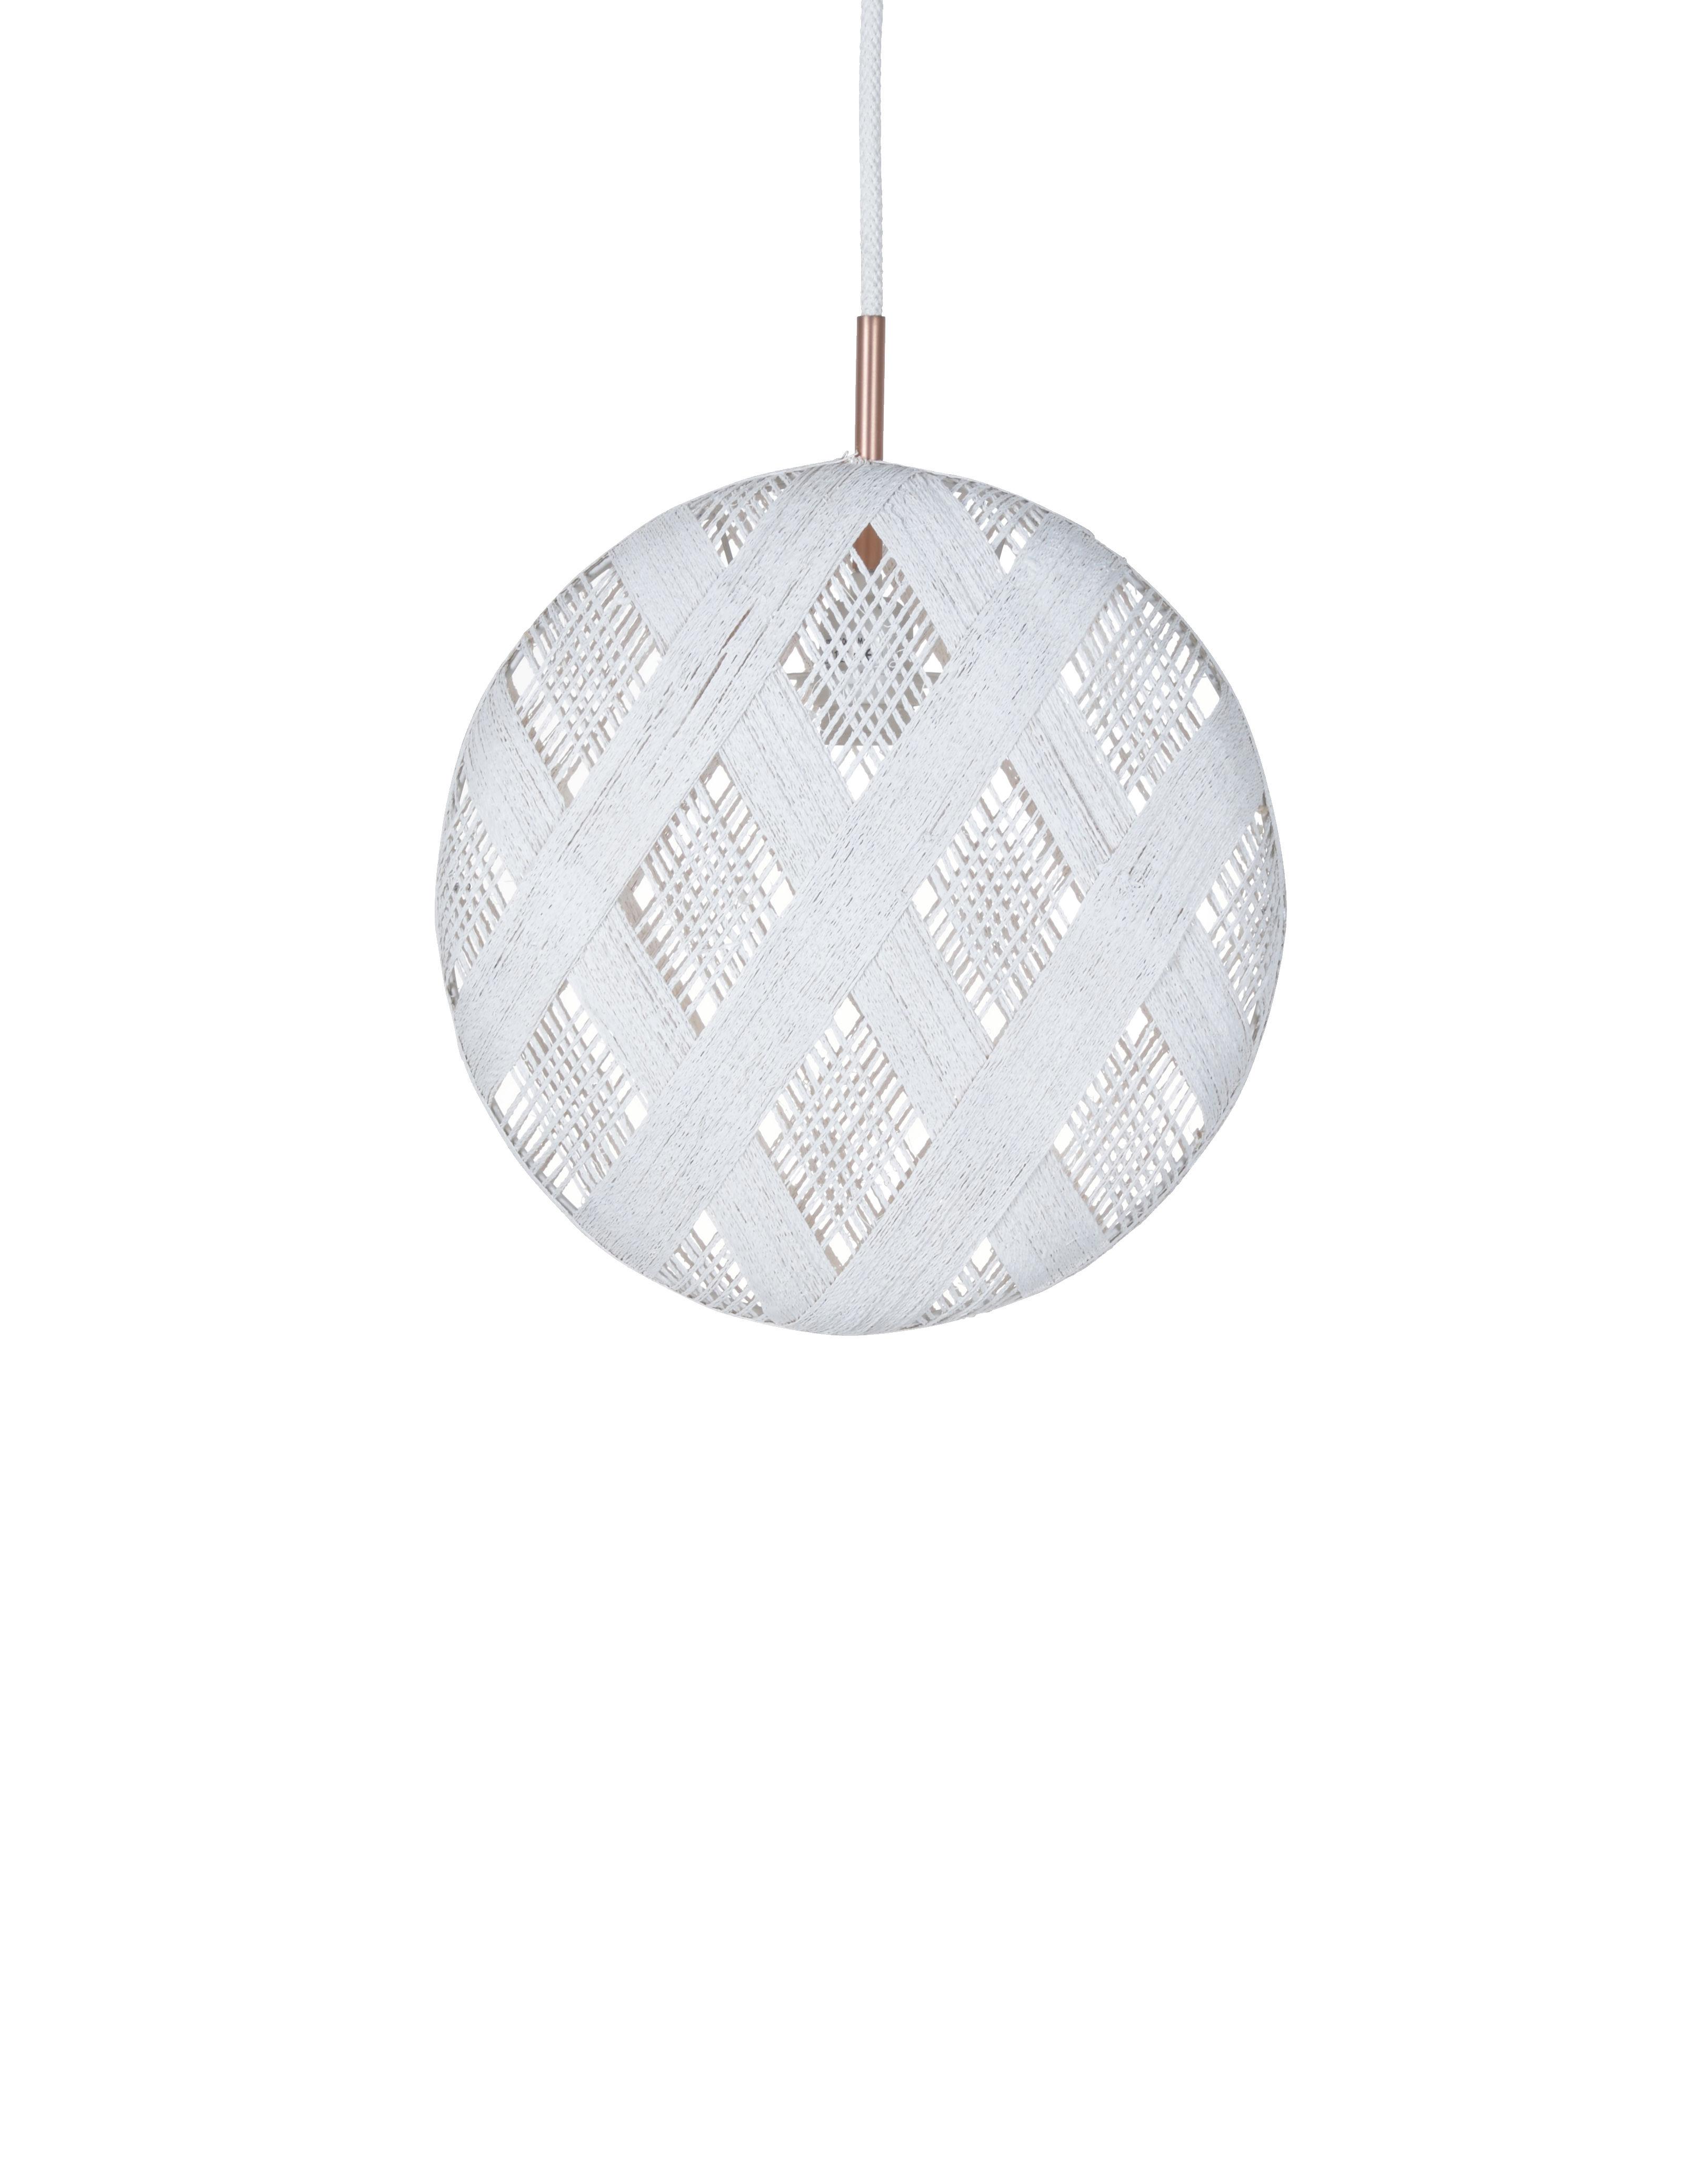 Lighting - Pendant Lighting - Chanpen Diamond Pendant - Ø  26 cm by Forestier - White / Diamond patterns - Woven acaba